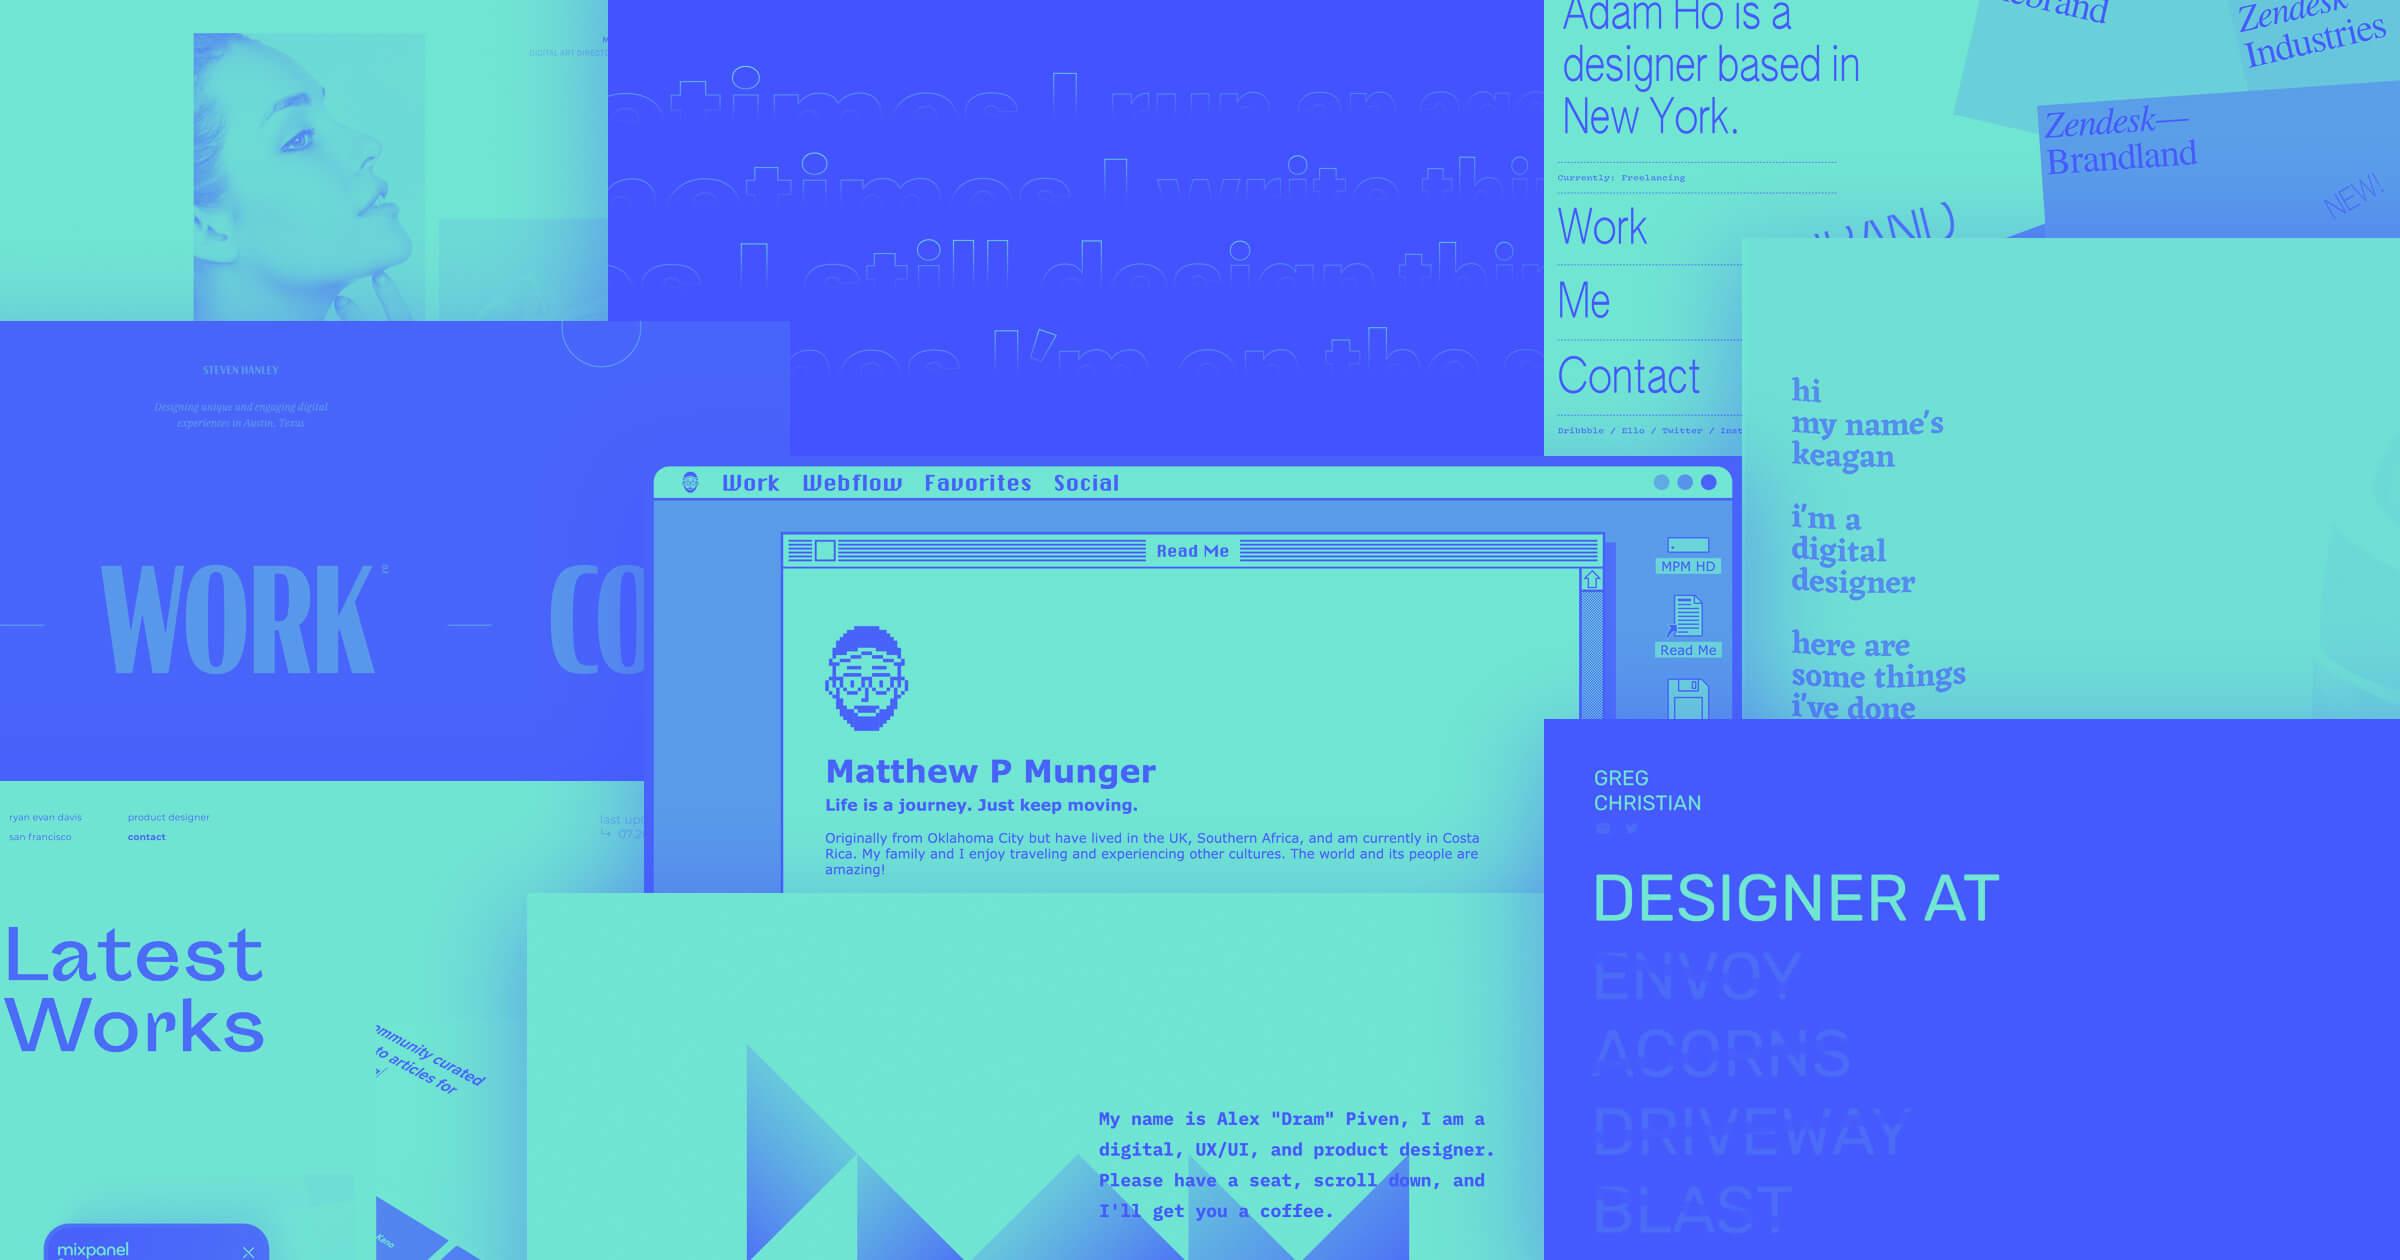 27 Unique Design Portfolio Examples Built In Webflow Webflow Blog